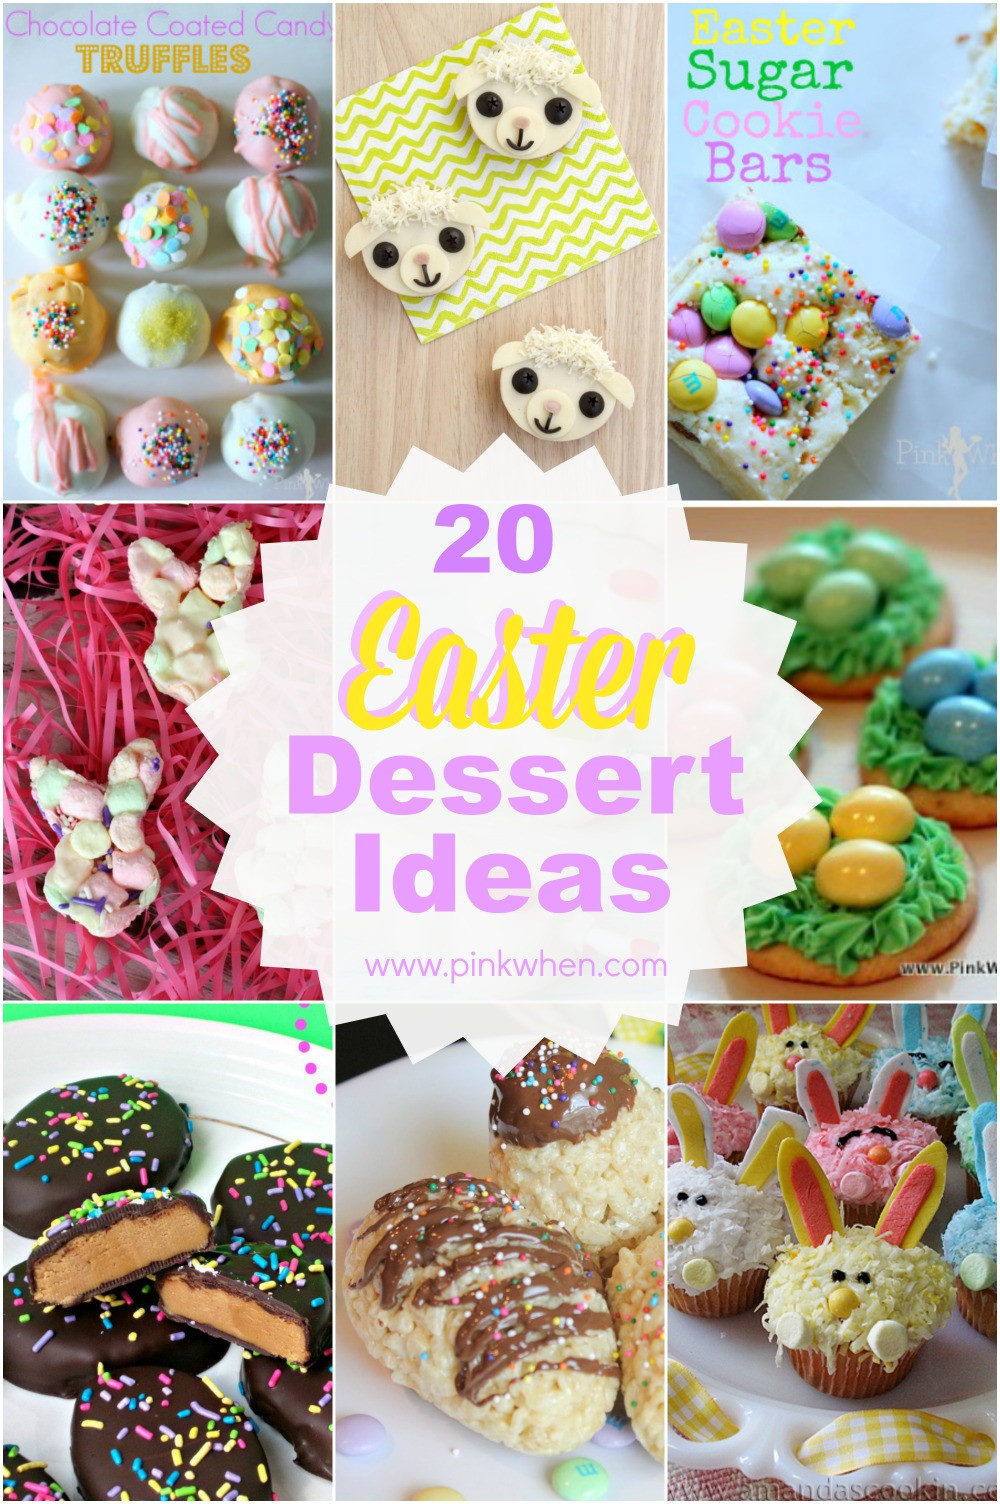 Easter Dessert Ideas  20 Delicious Easter Dessert Ideas PinkWhen